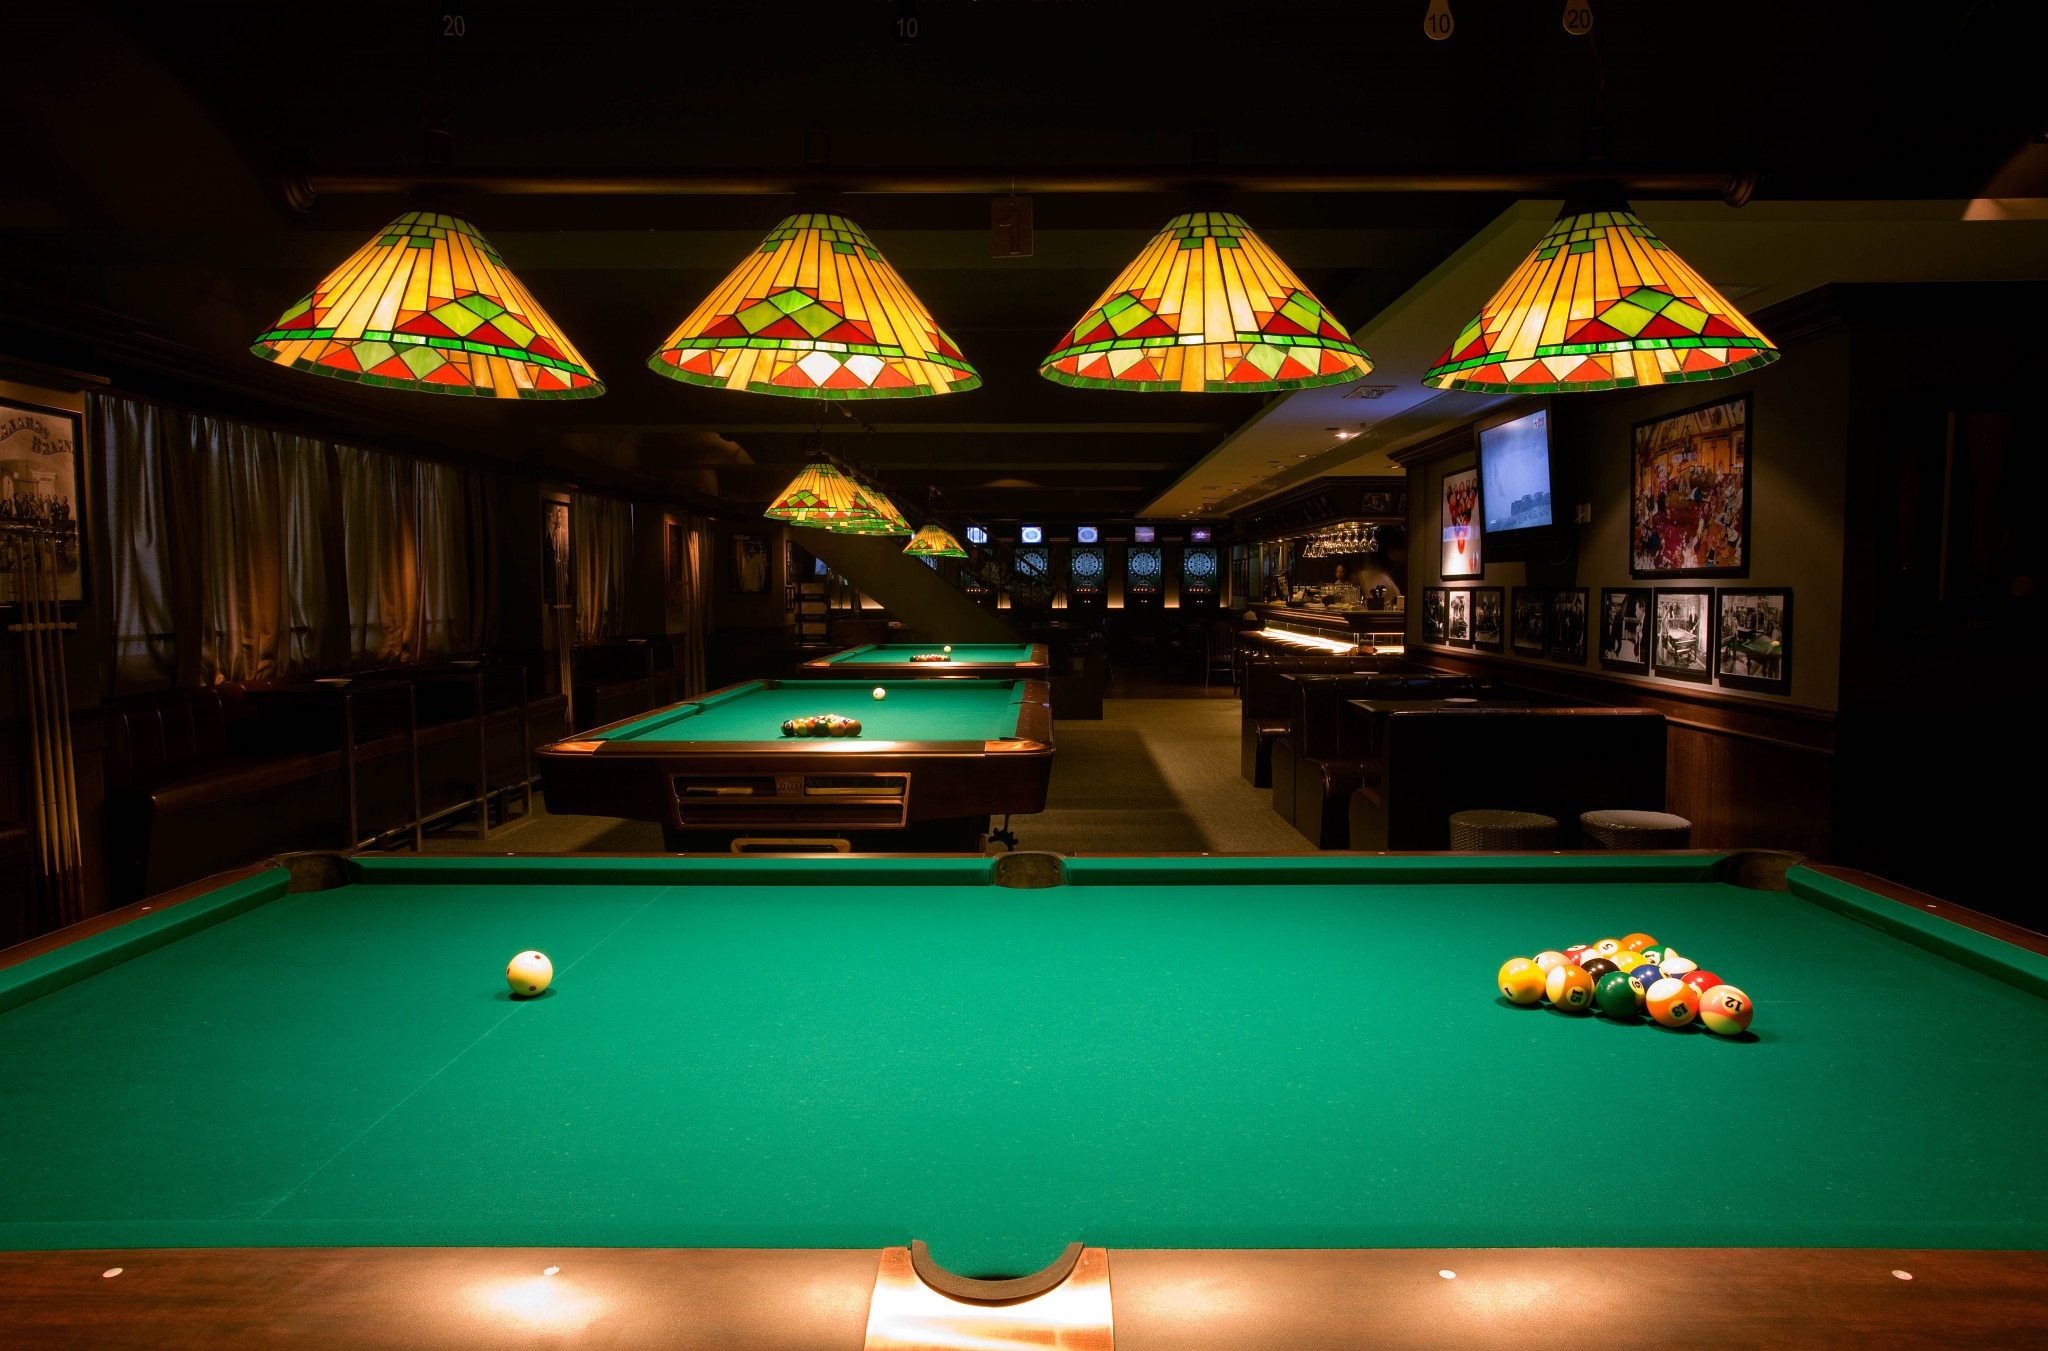 Knutsford Terrace 尖沙咀諾士佛臺Joe's Billiards & Bar酒吧 桌球 飛鏢 Beer Pong